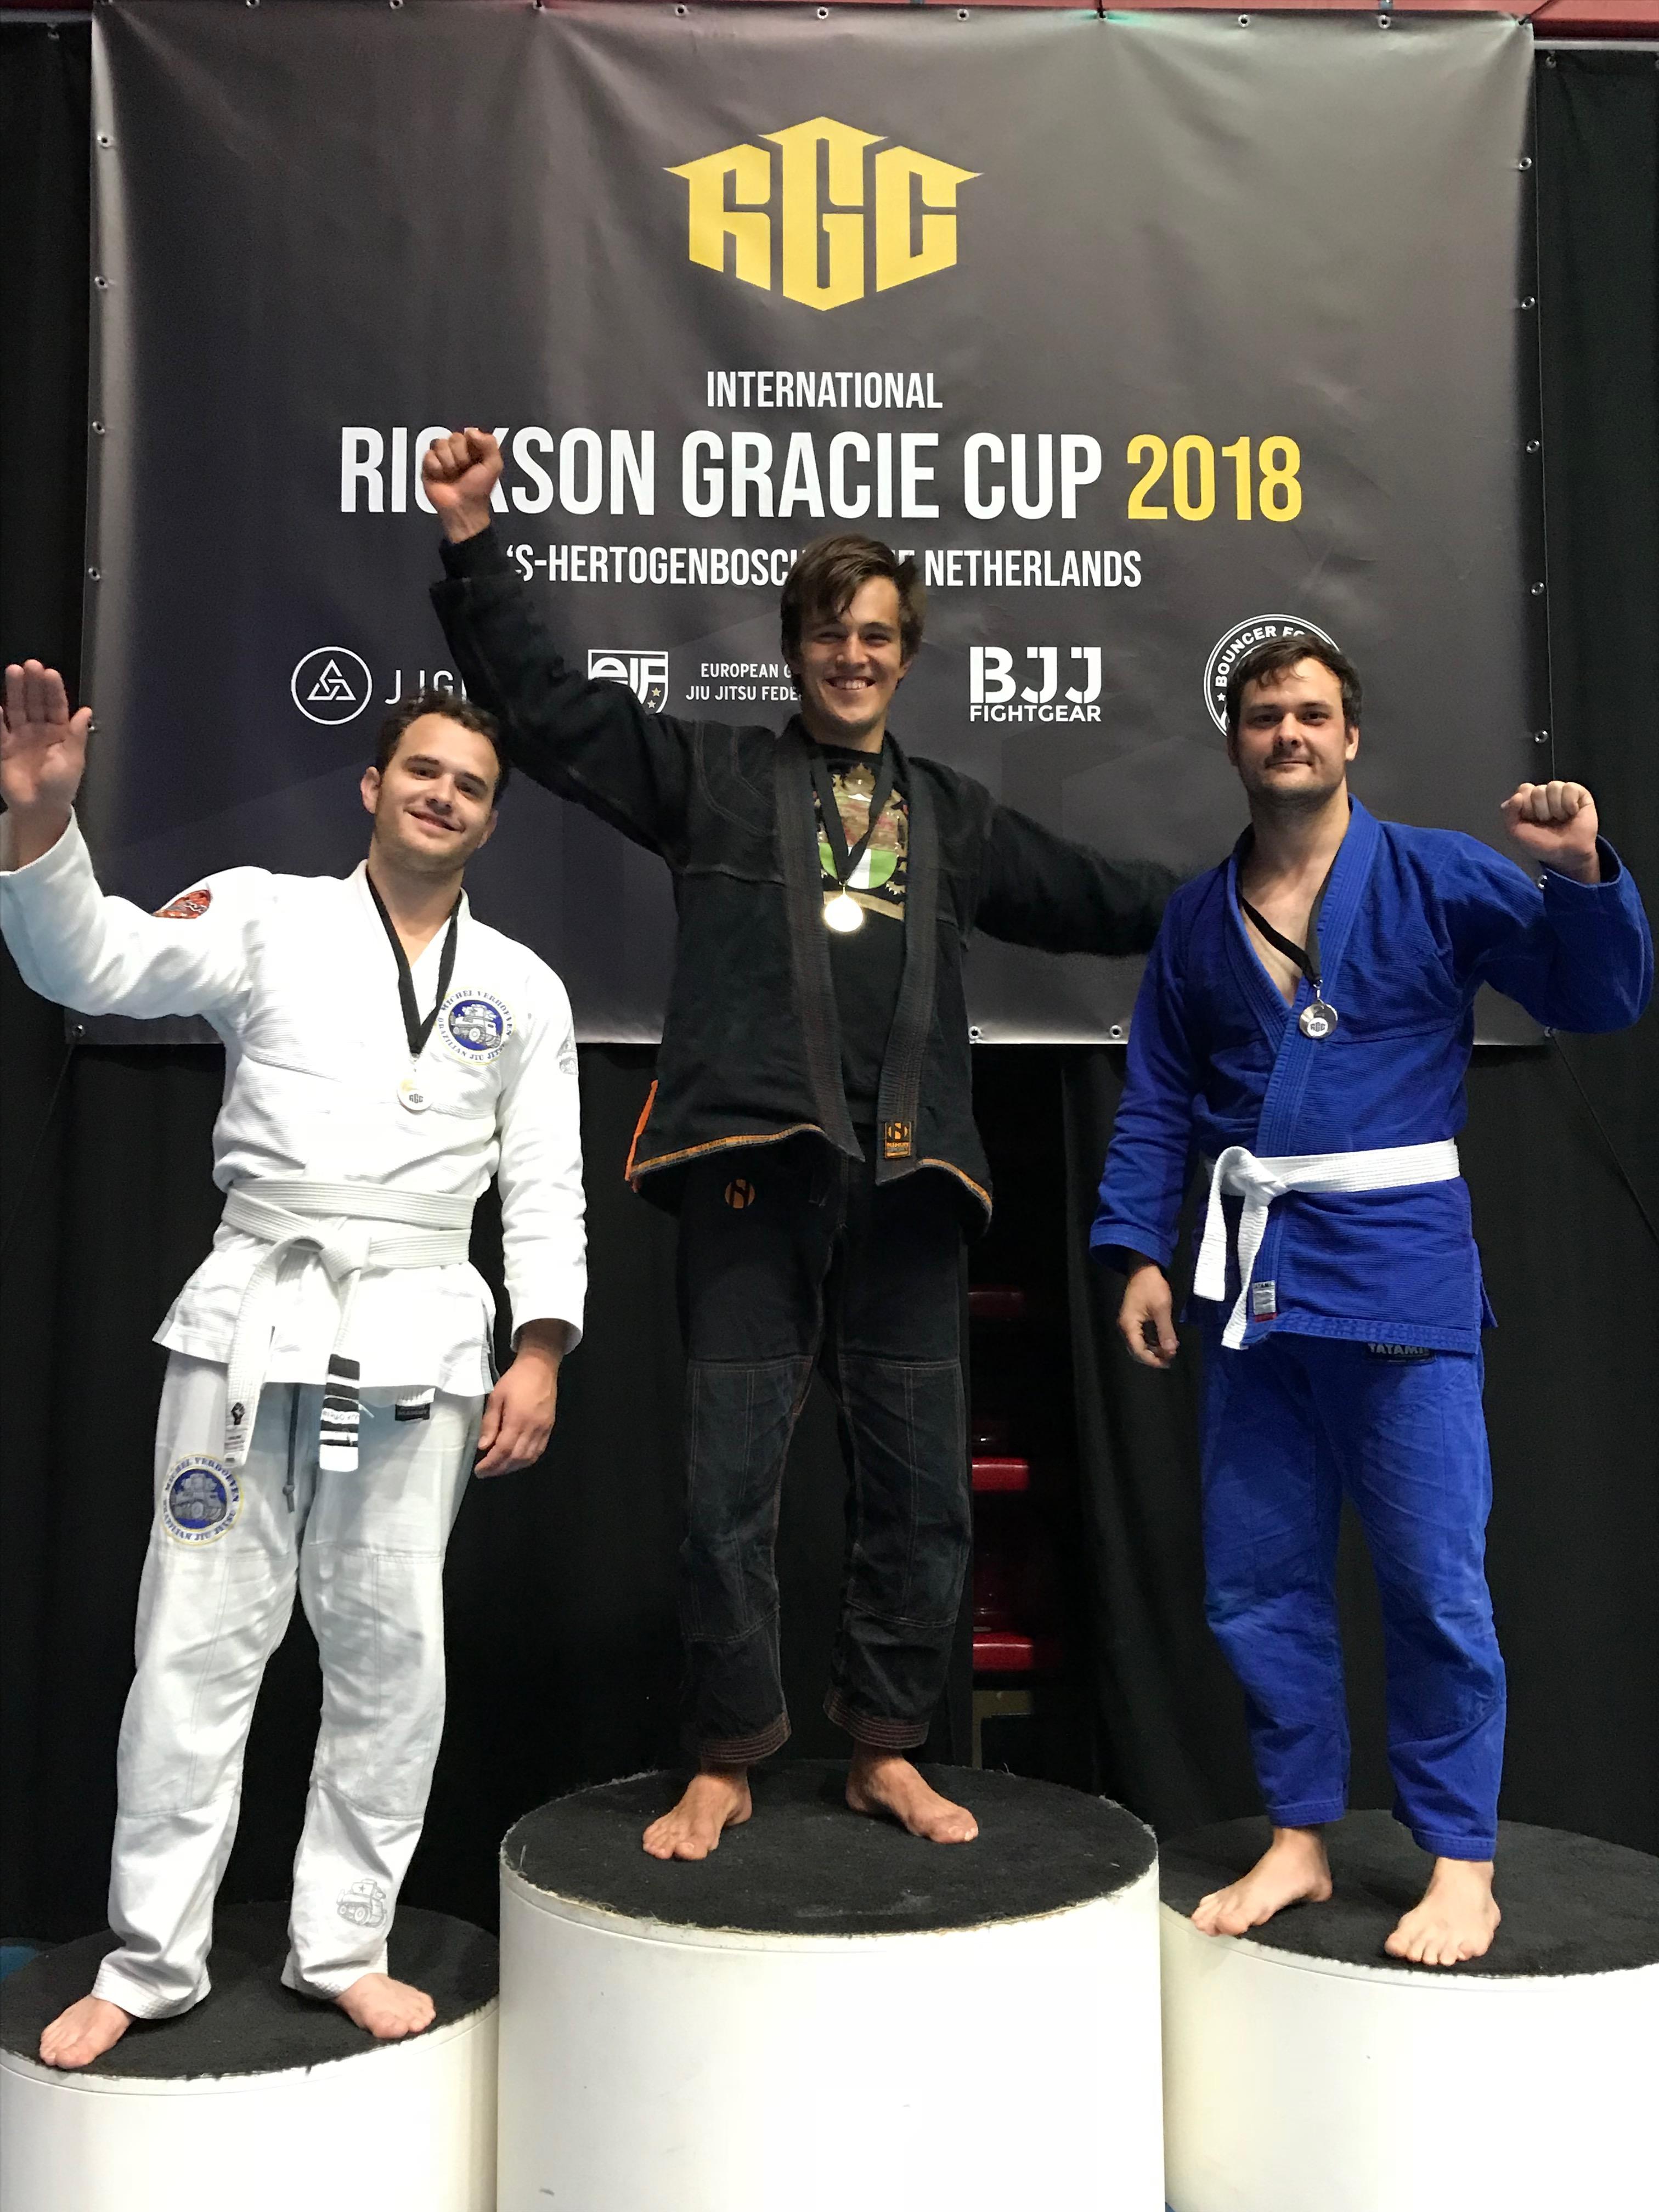 gracie-jiu-jitsu-gouda_bjj-braziliaans-jiu-jitsu-zelfverdediging_selfdefense-logo-dojo-rickson-gracie-cup-2018-casper-goud+brons-3